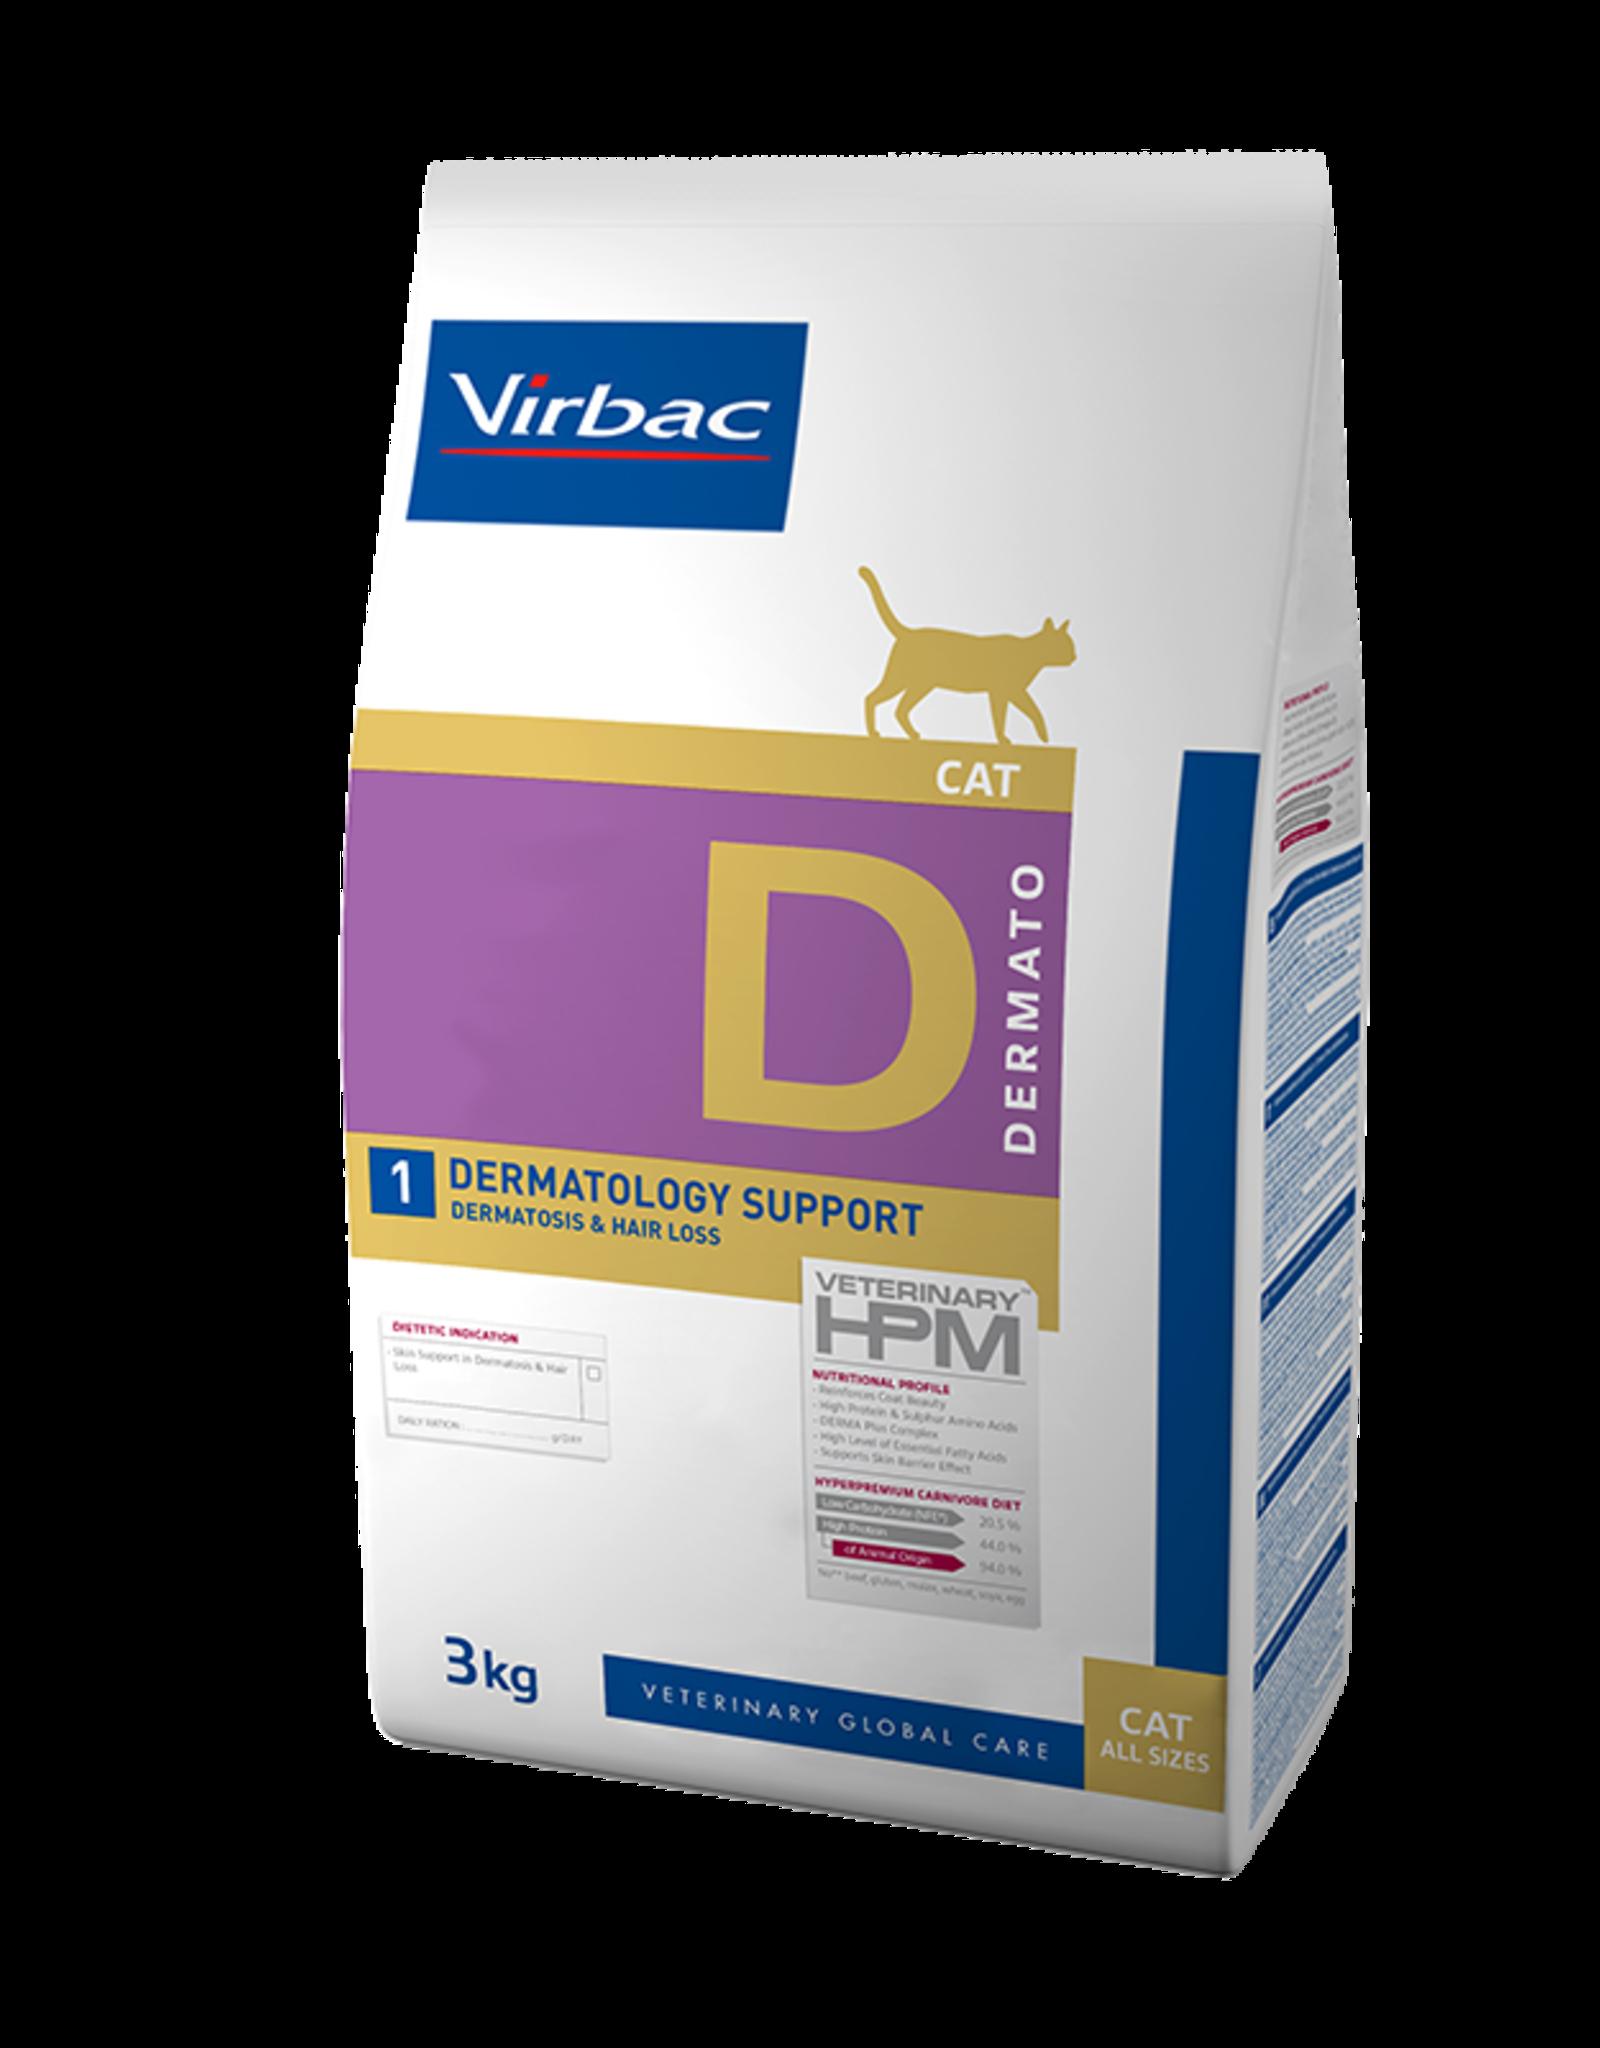 Virbac Virbac Hpm Katze Dermatology Support D1 3kg